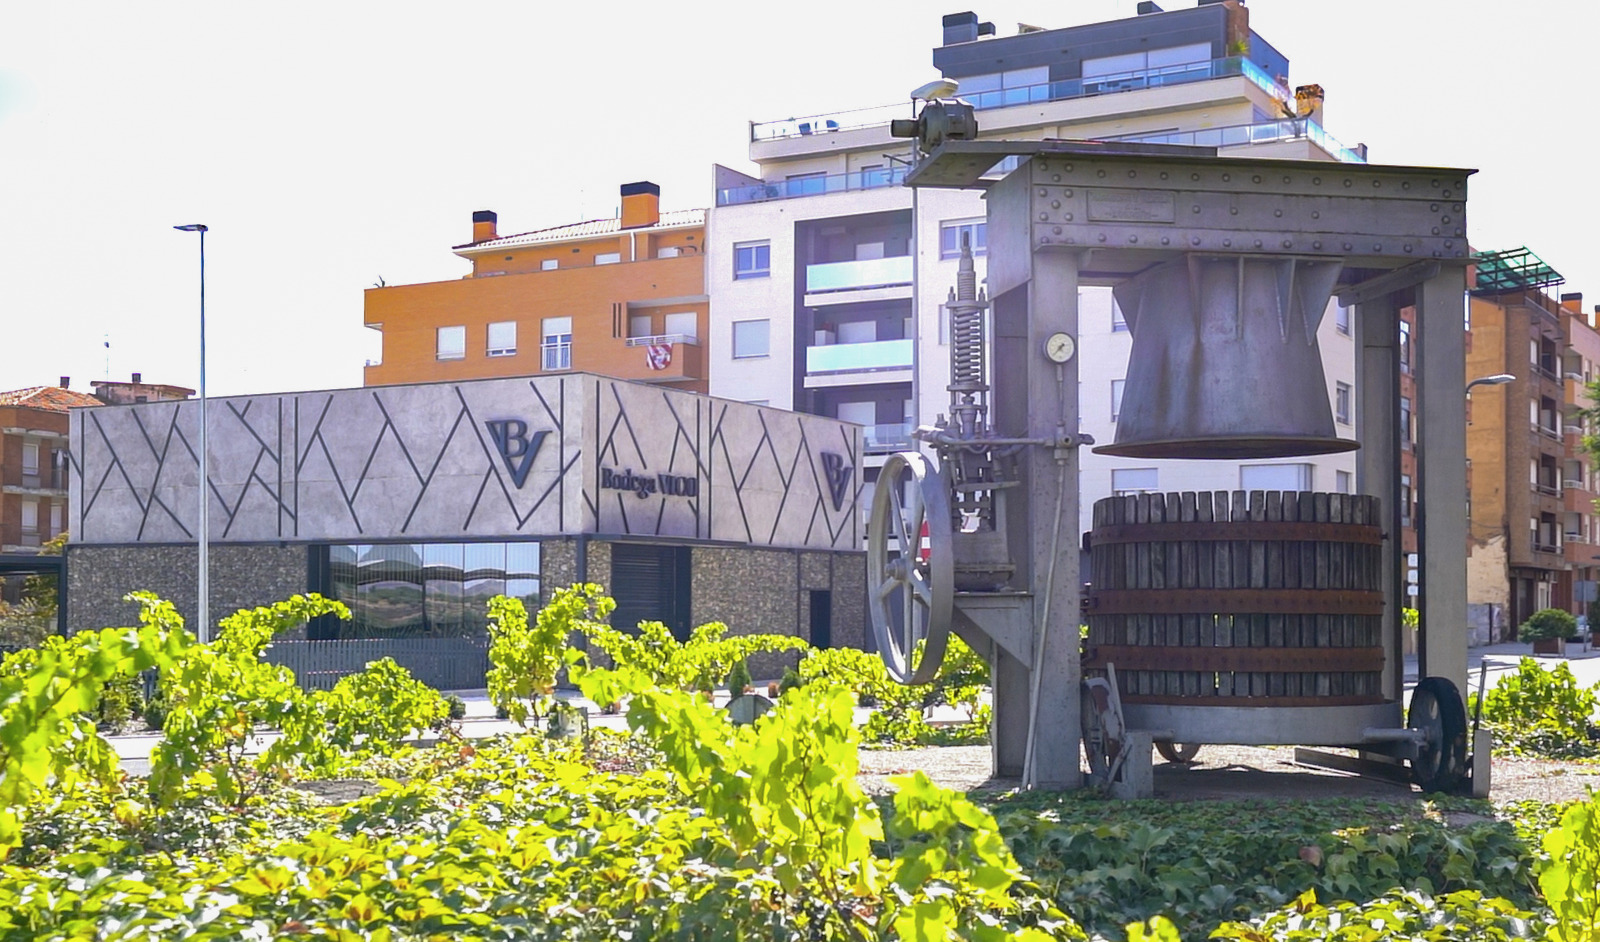 Tienda Bodega Vico